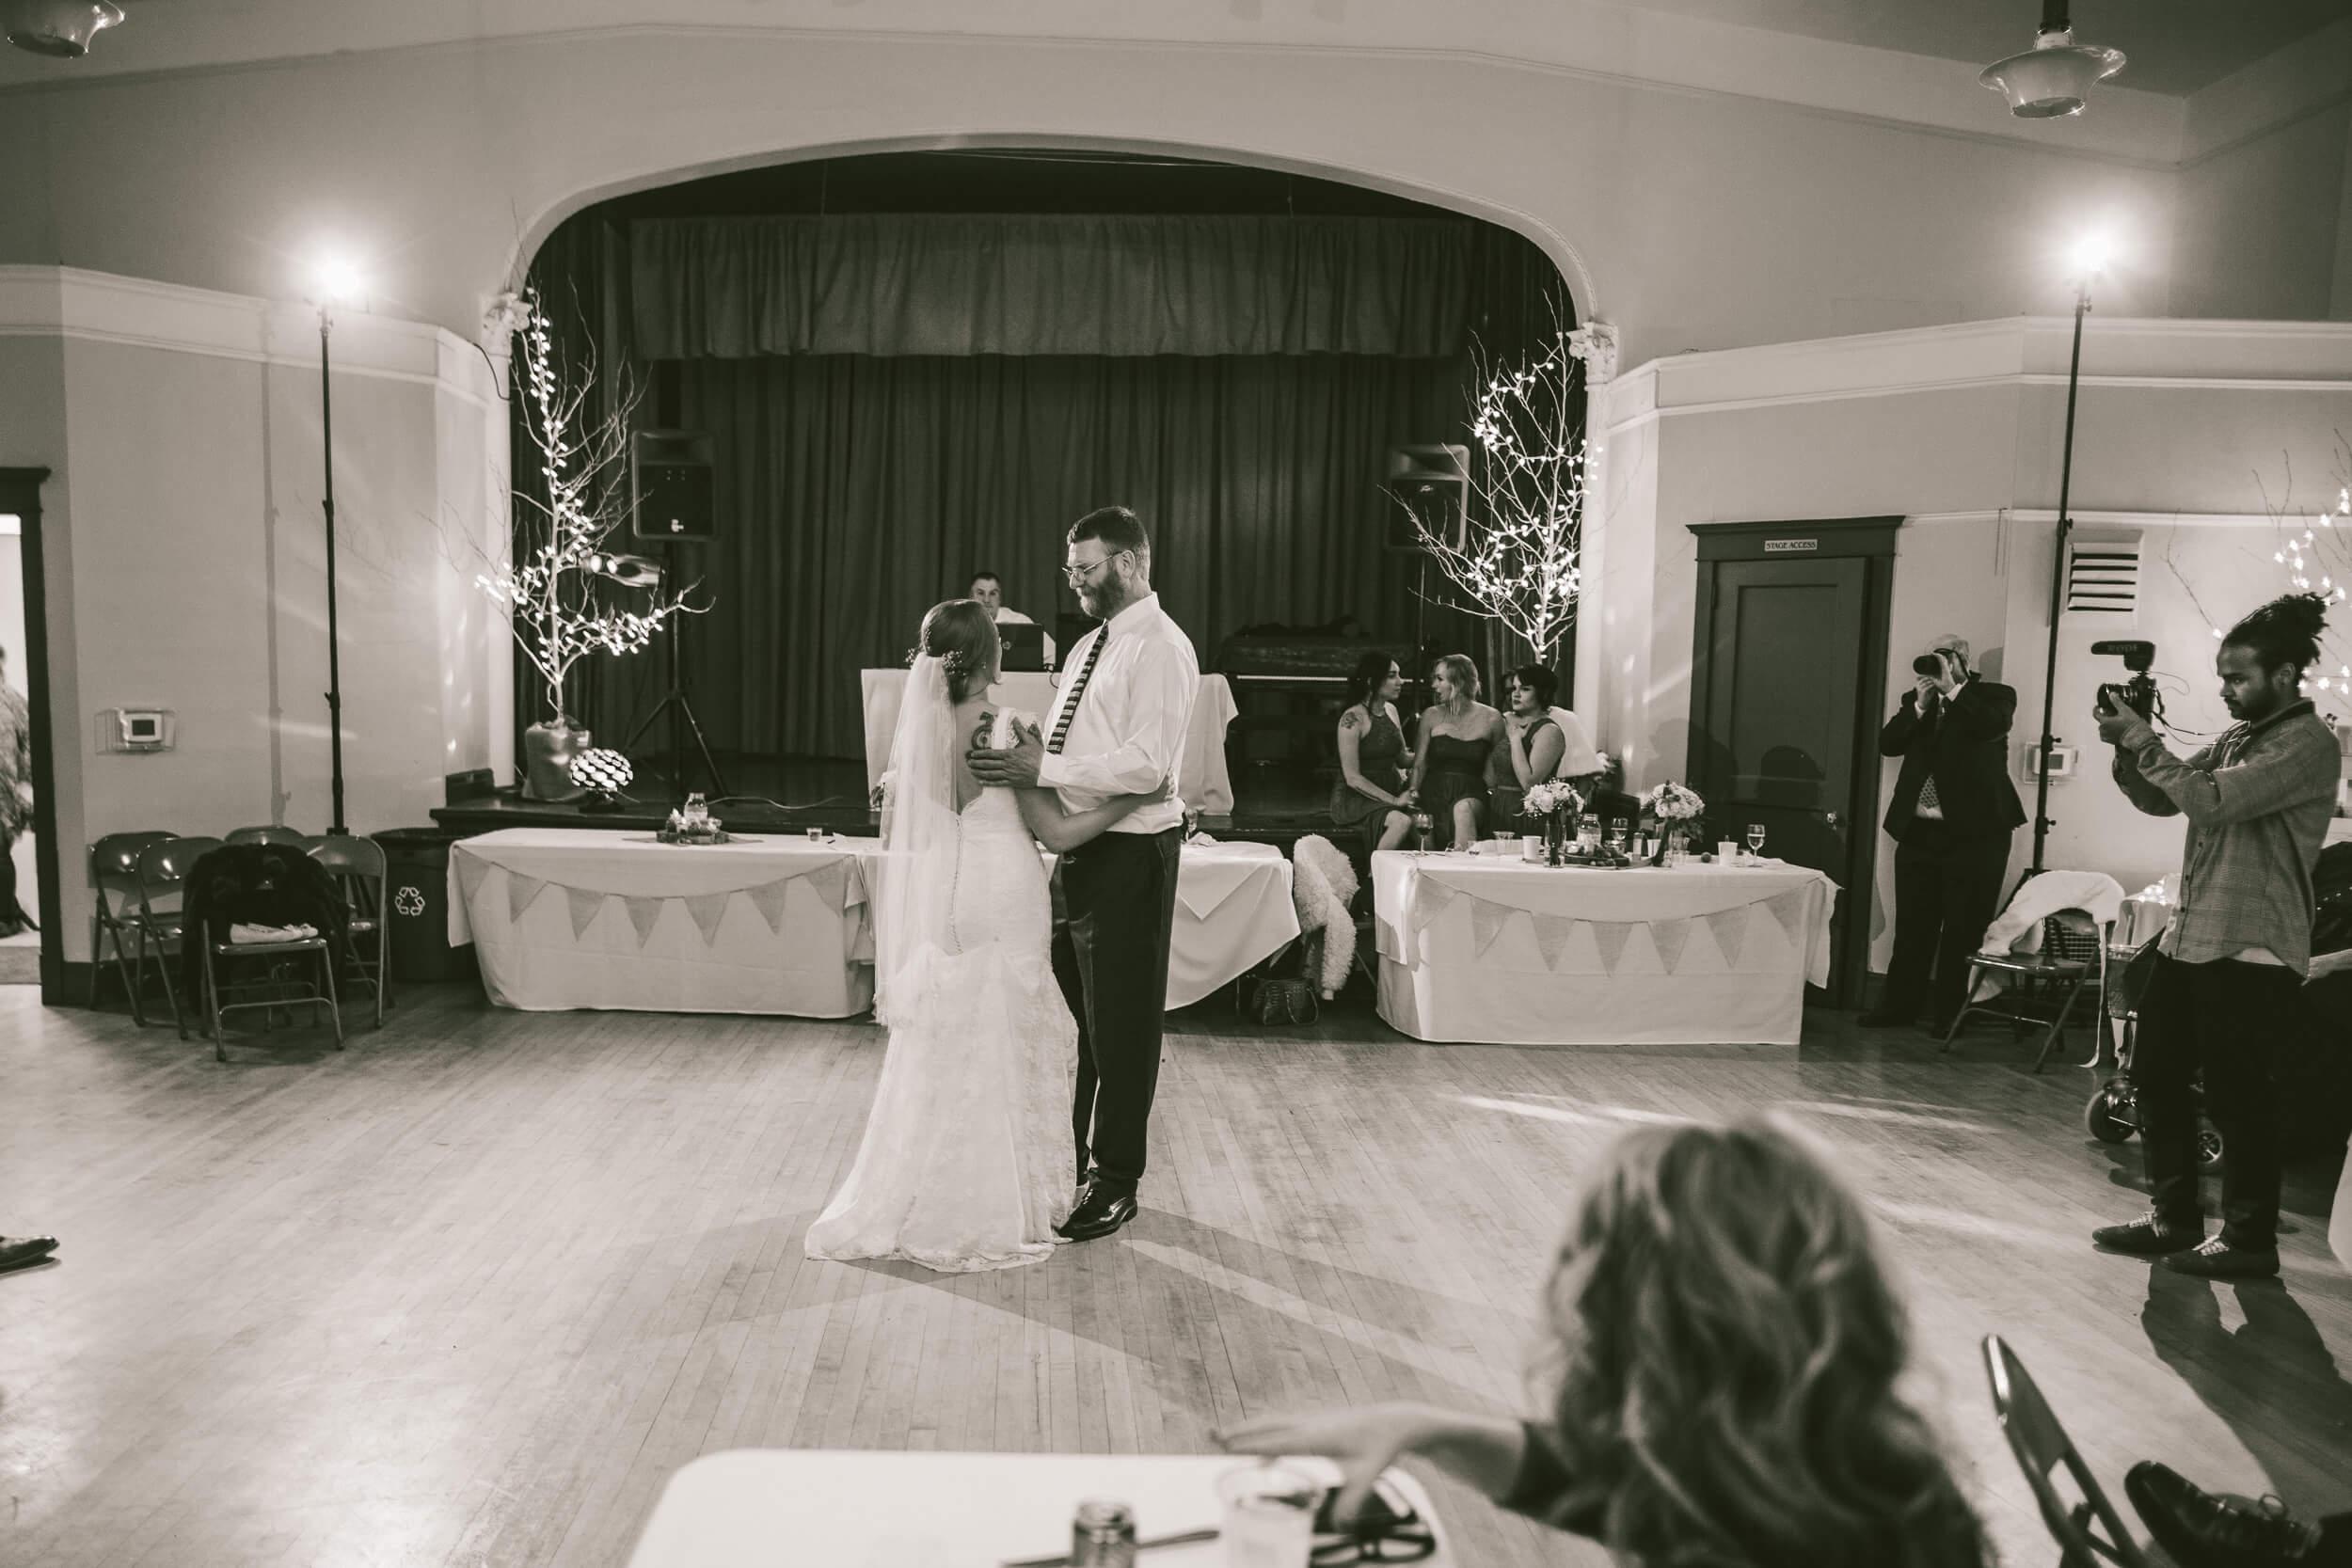 mukogawa winter wedding in spokane (287).jpg